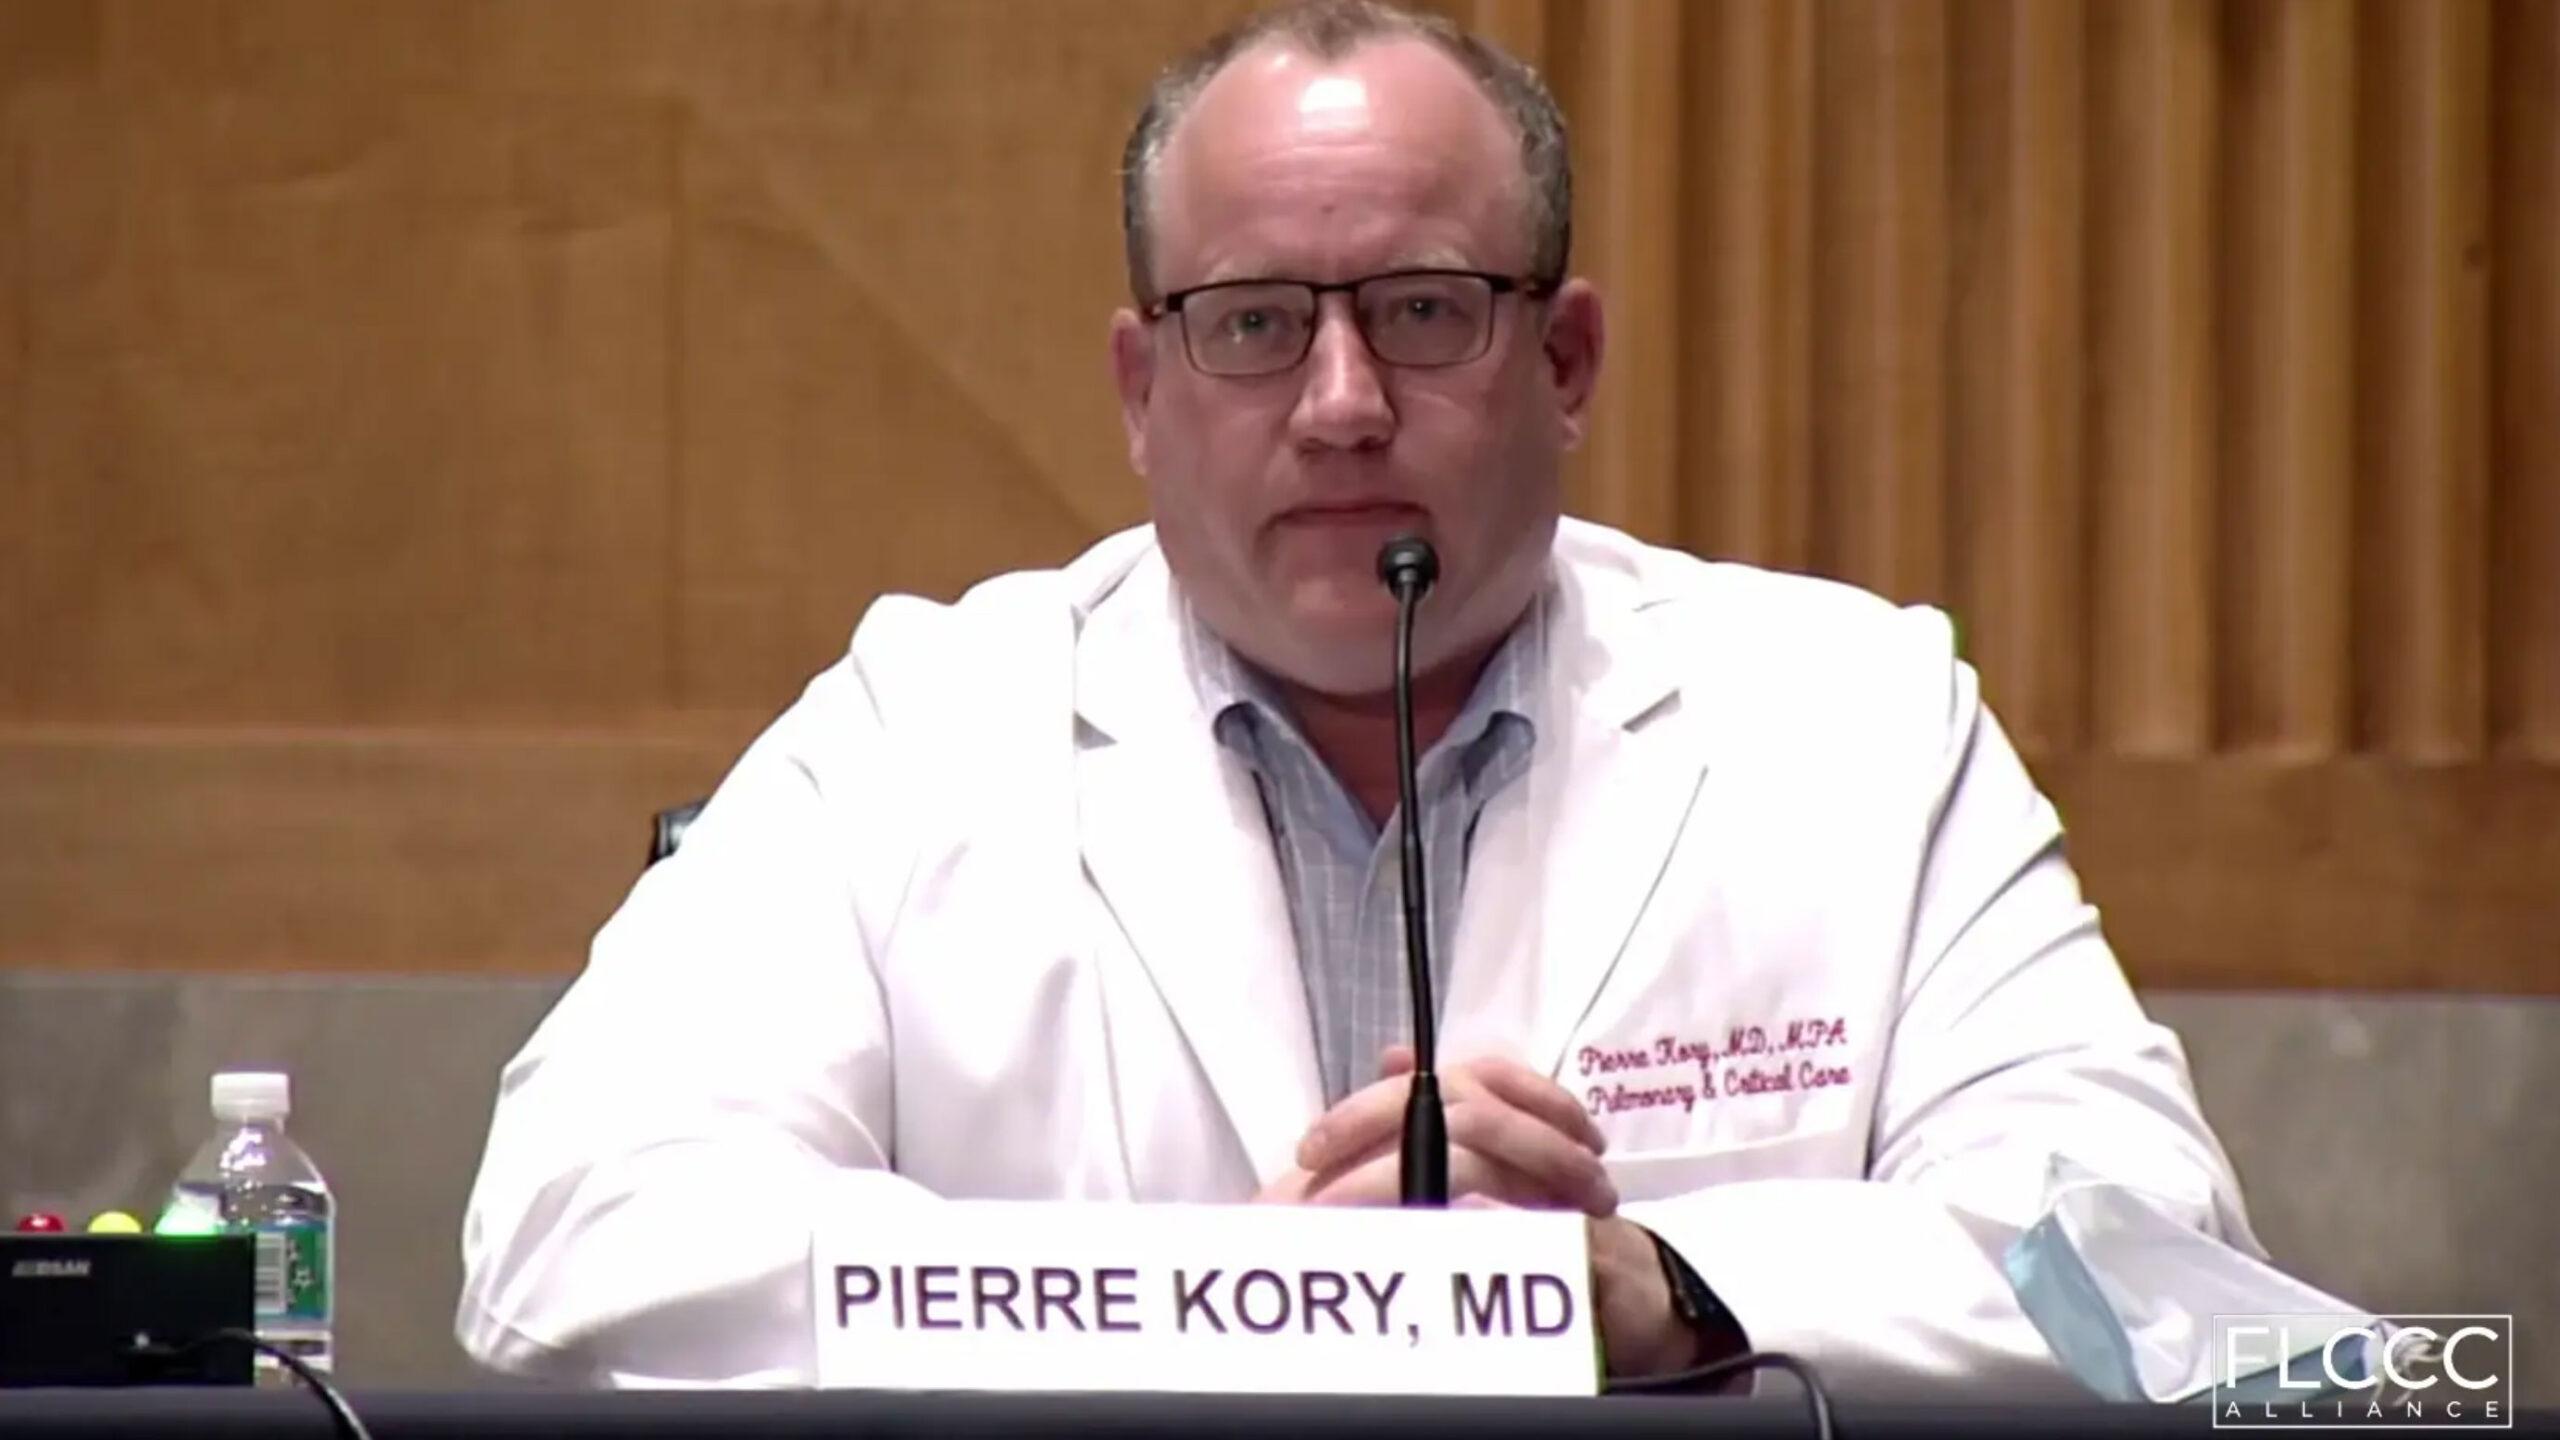 Pierre Kory expone sobre ivermectina y Covid-19